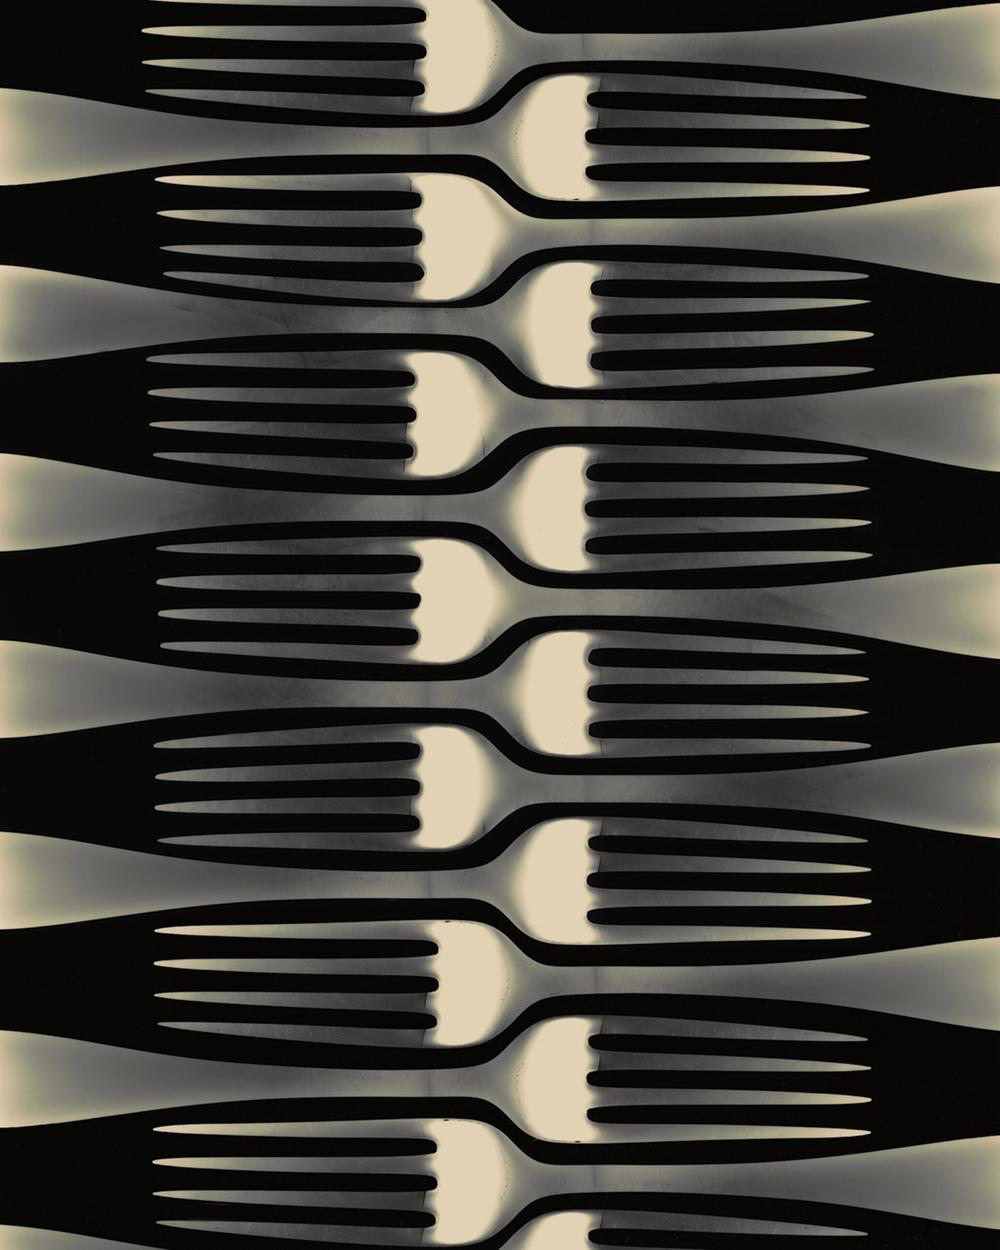 forks1_lo res.jpg